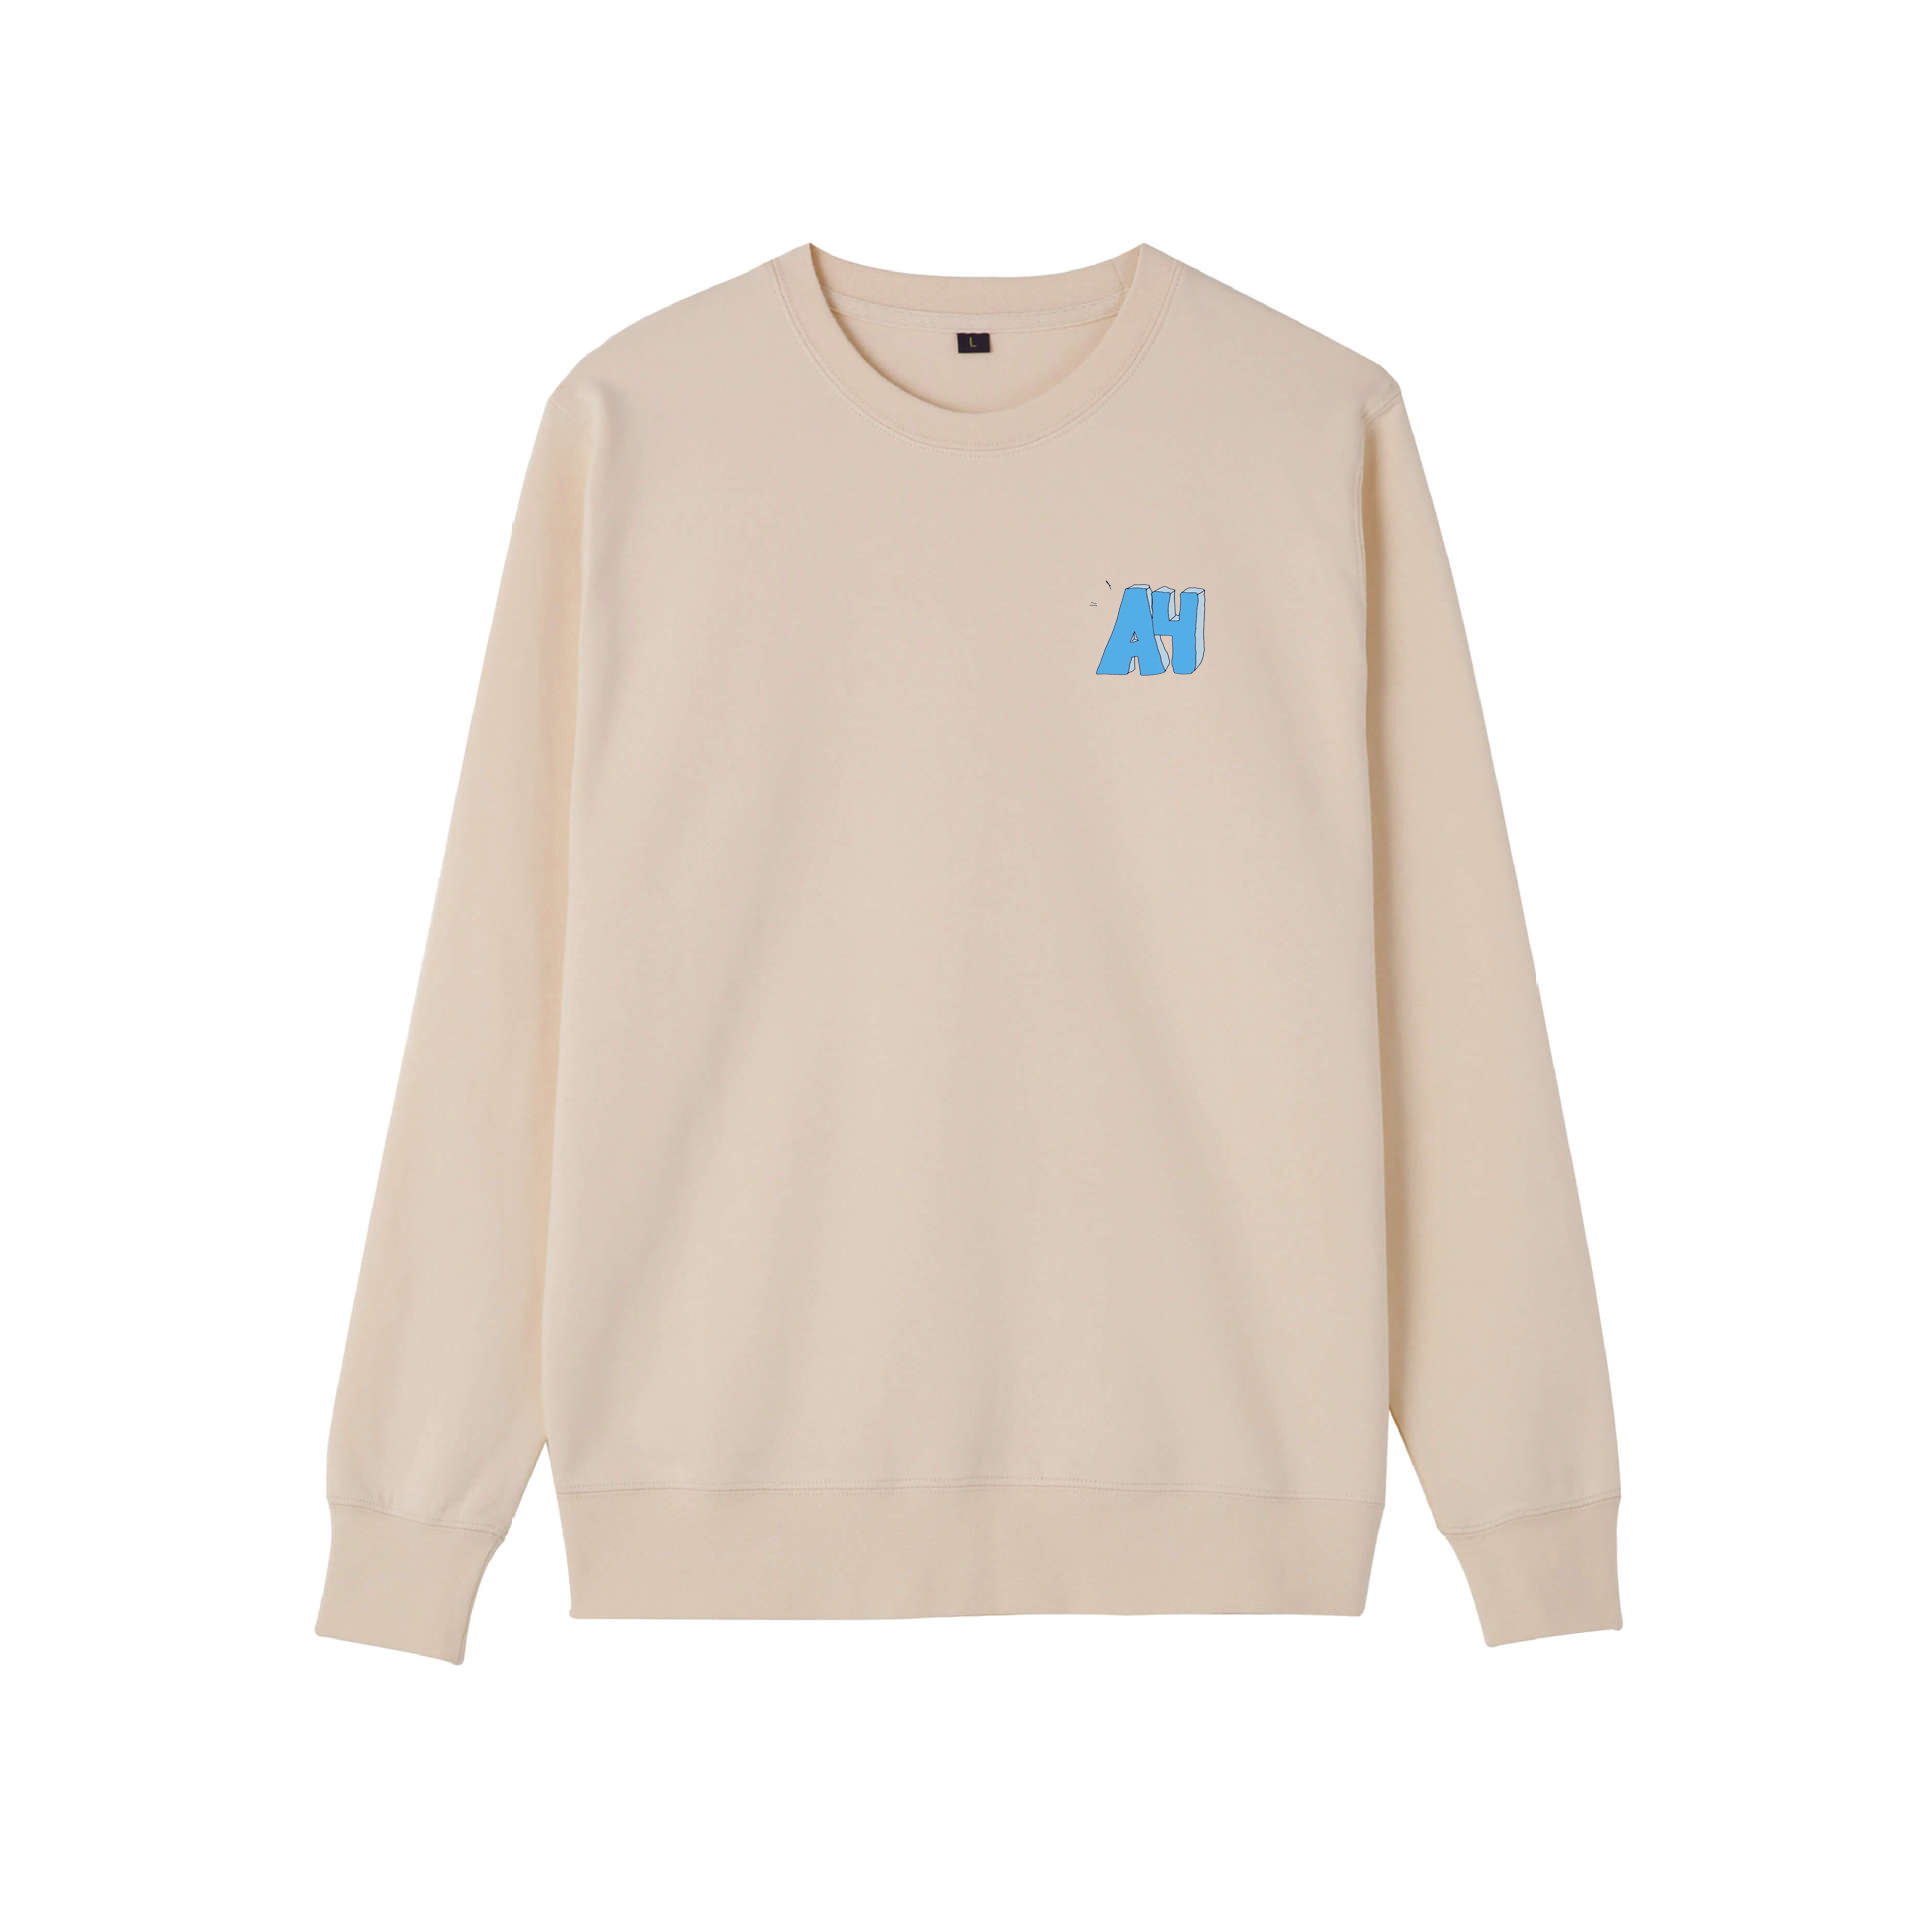 Men's Merch а4 Sweatshirts Spring Autumn Unisex Long Sleeve Sweatshirt Casual Loose Pullovers мерч A4 Tops Black White Khaki